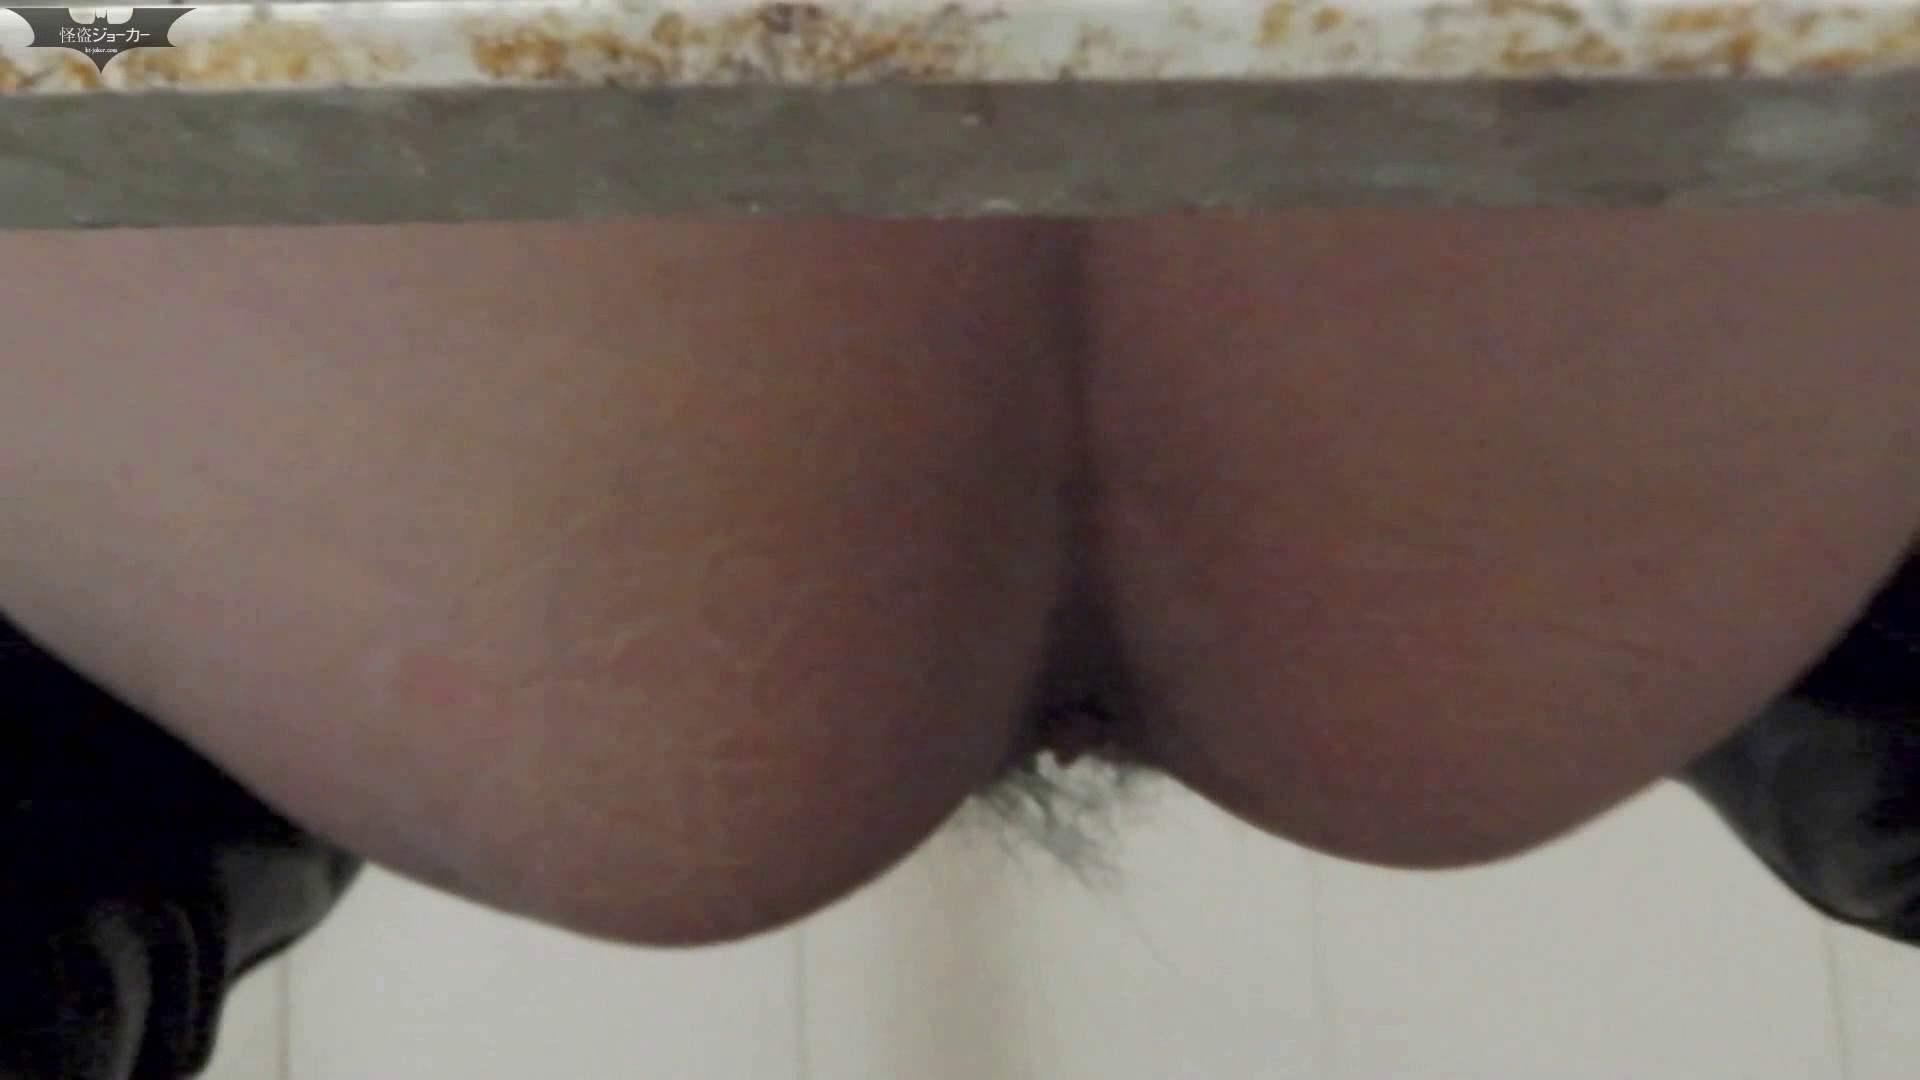 Vol.06 ピチピチが入室きめ細かくマッシュルームのような肌に癒される テクニック | エロくん潜入  46連発 37